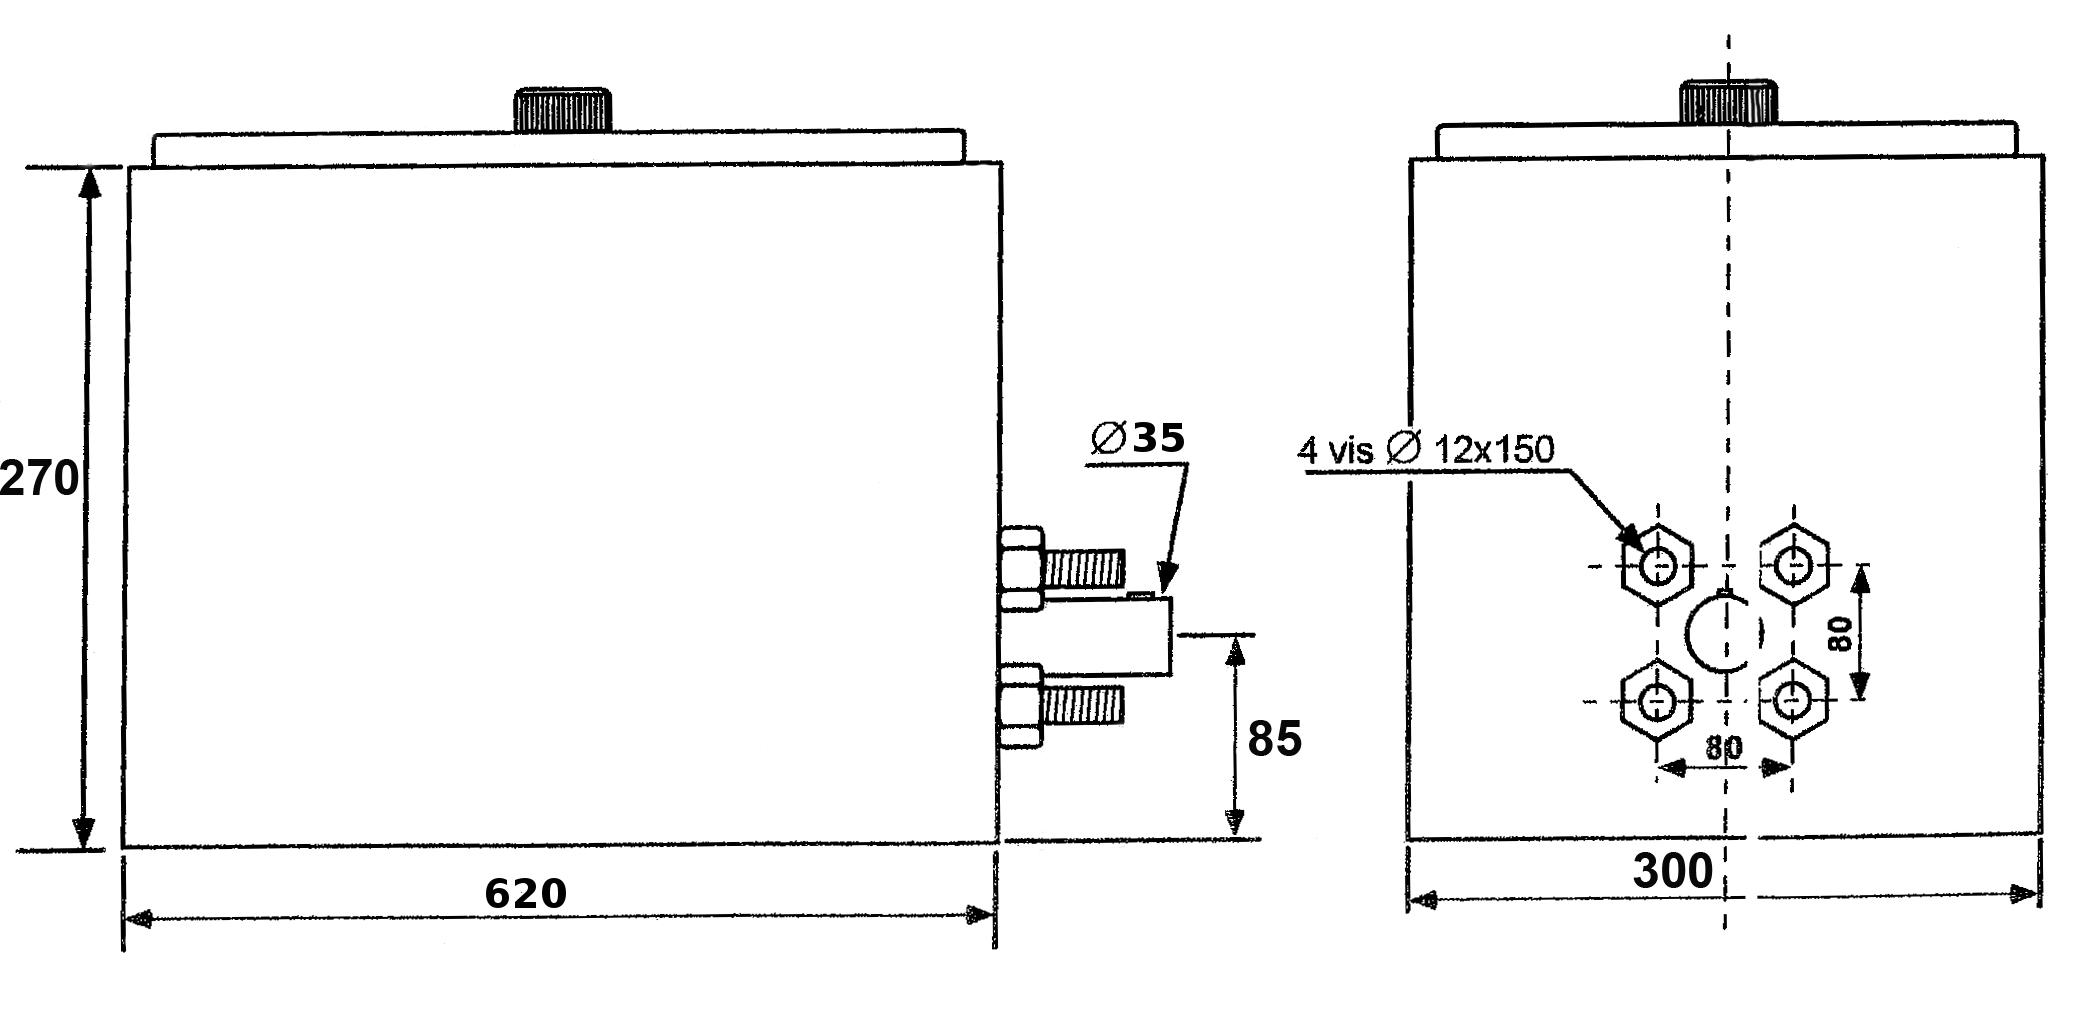 Schéma compresseur de bennage 18 a 24 T